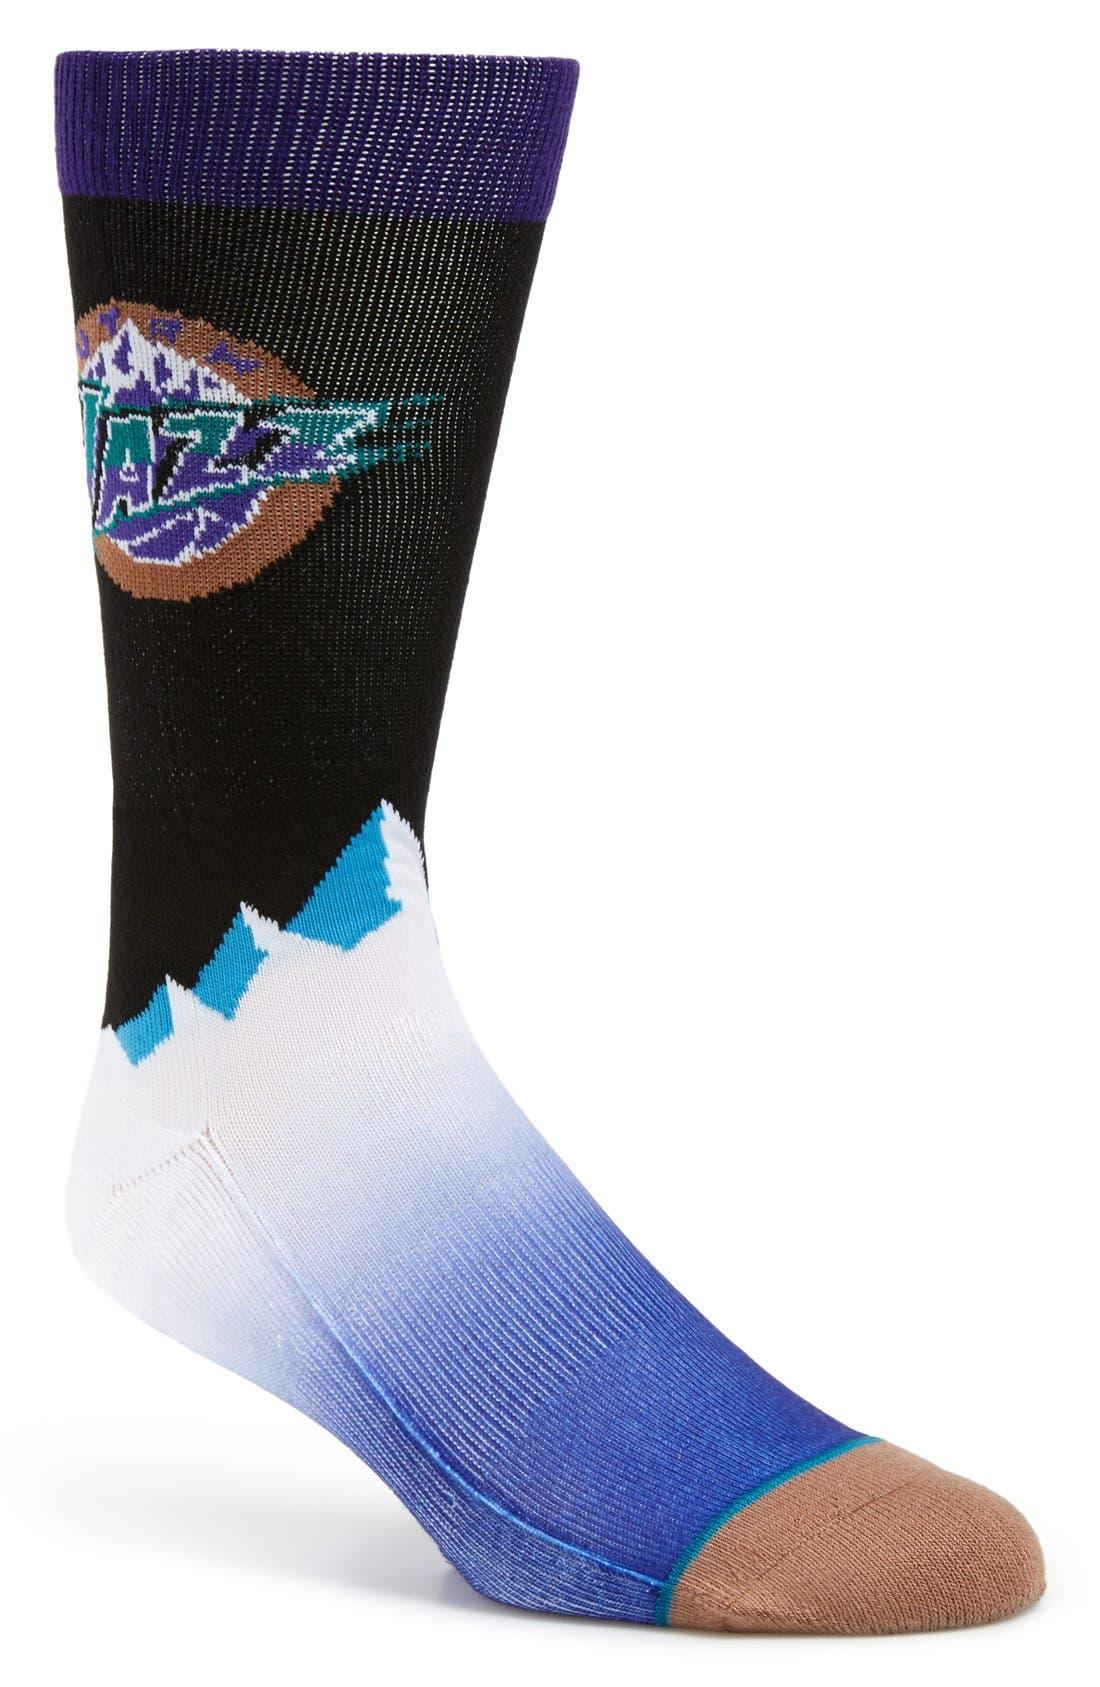 'Utah Jazz - NBA Legends' Socks,                             Main thumbnail 1, color,                             001